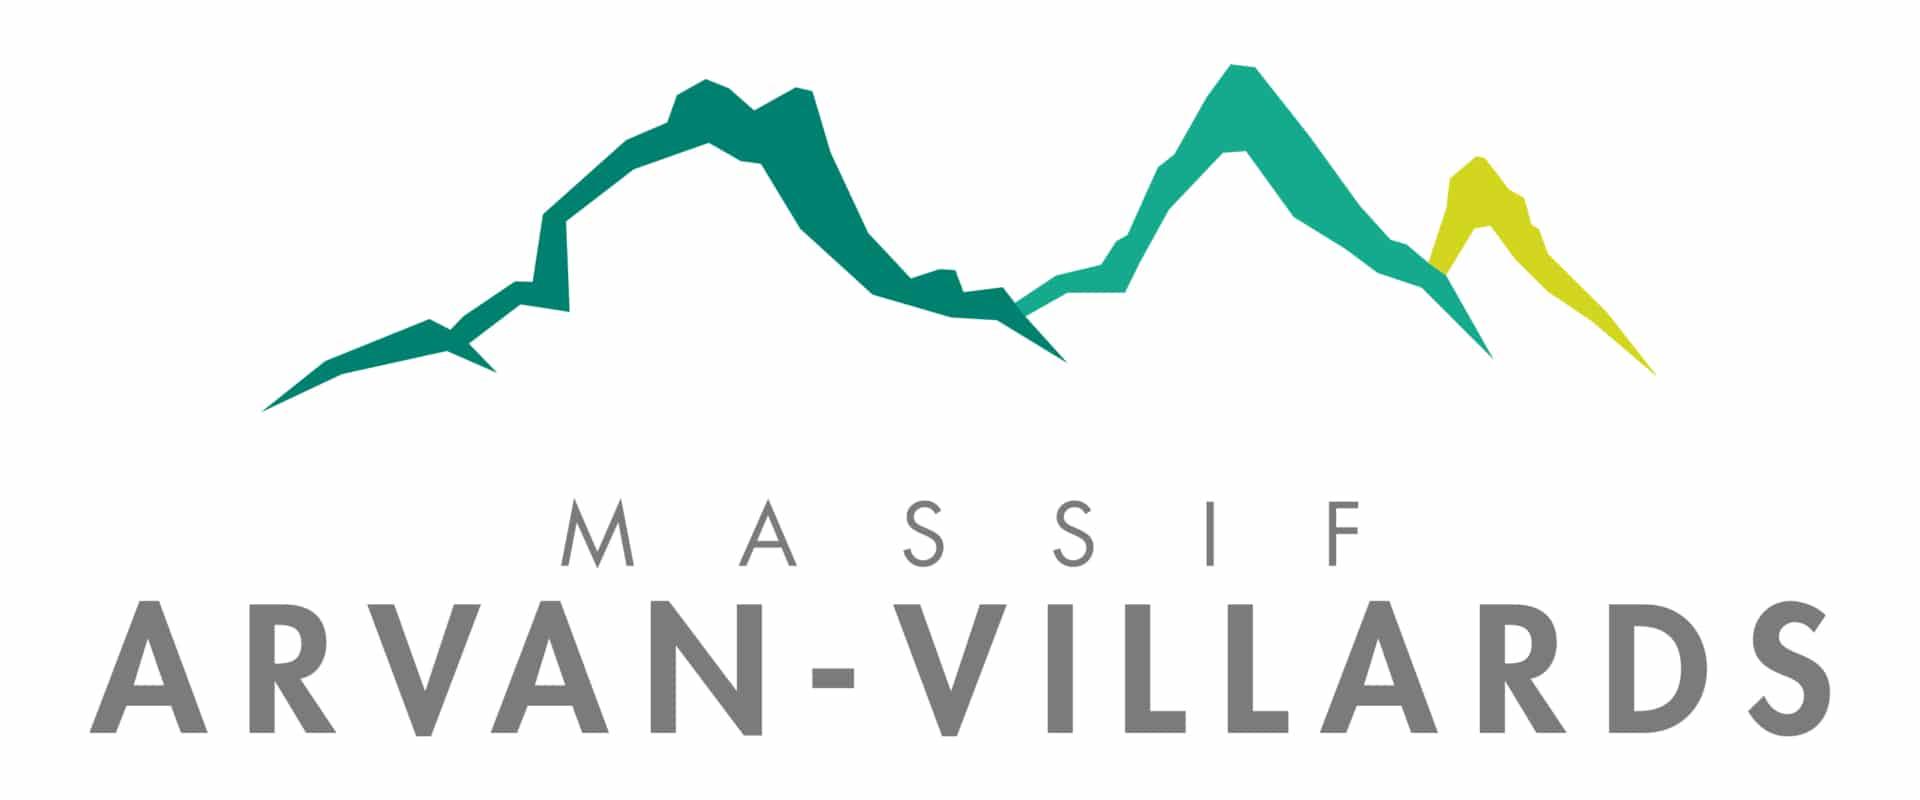 Massif Arvan-Villards : Fx Com'Unik relève le défi